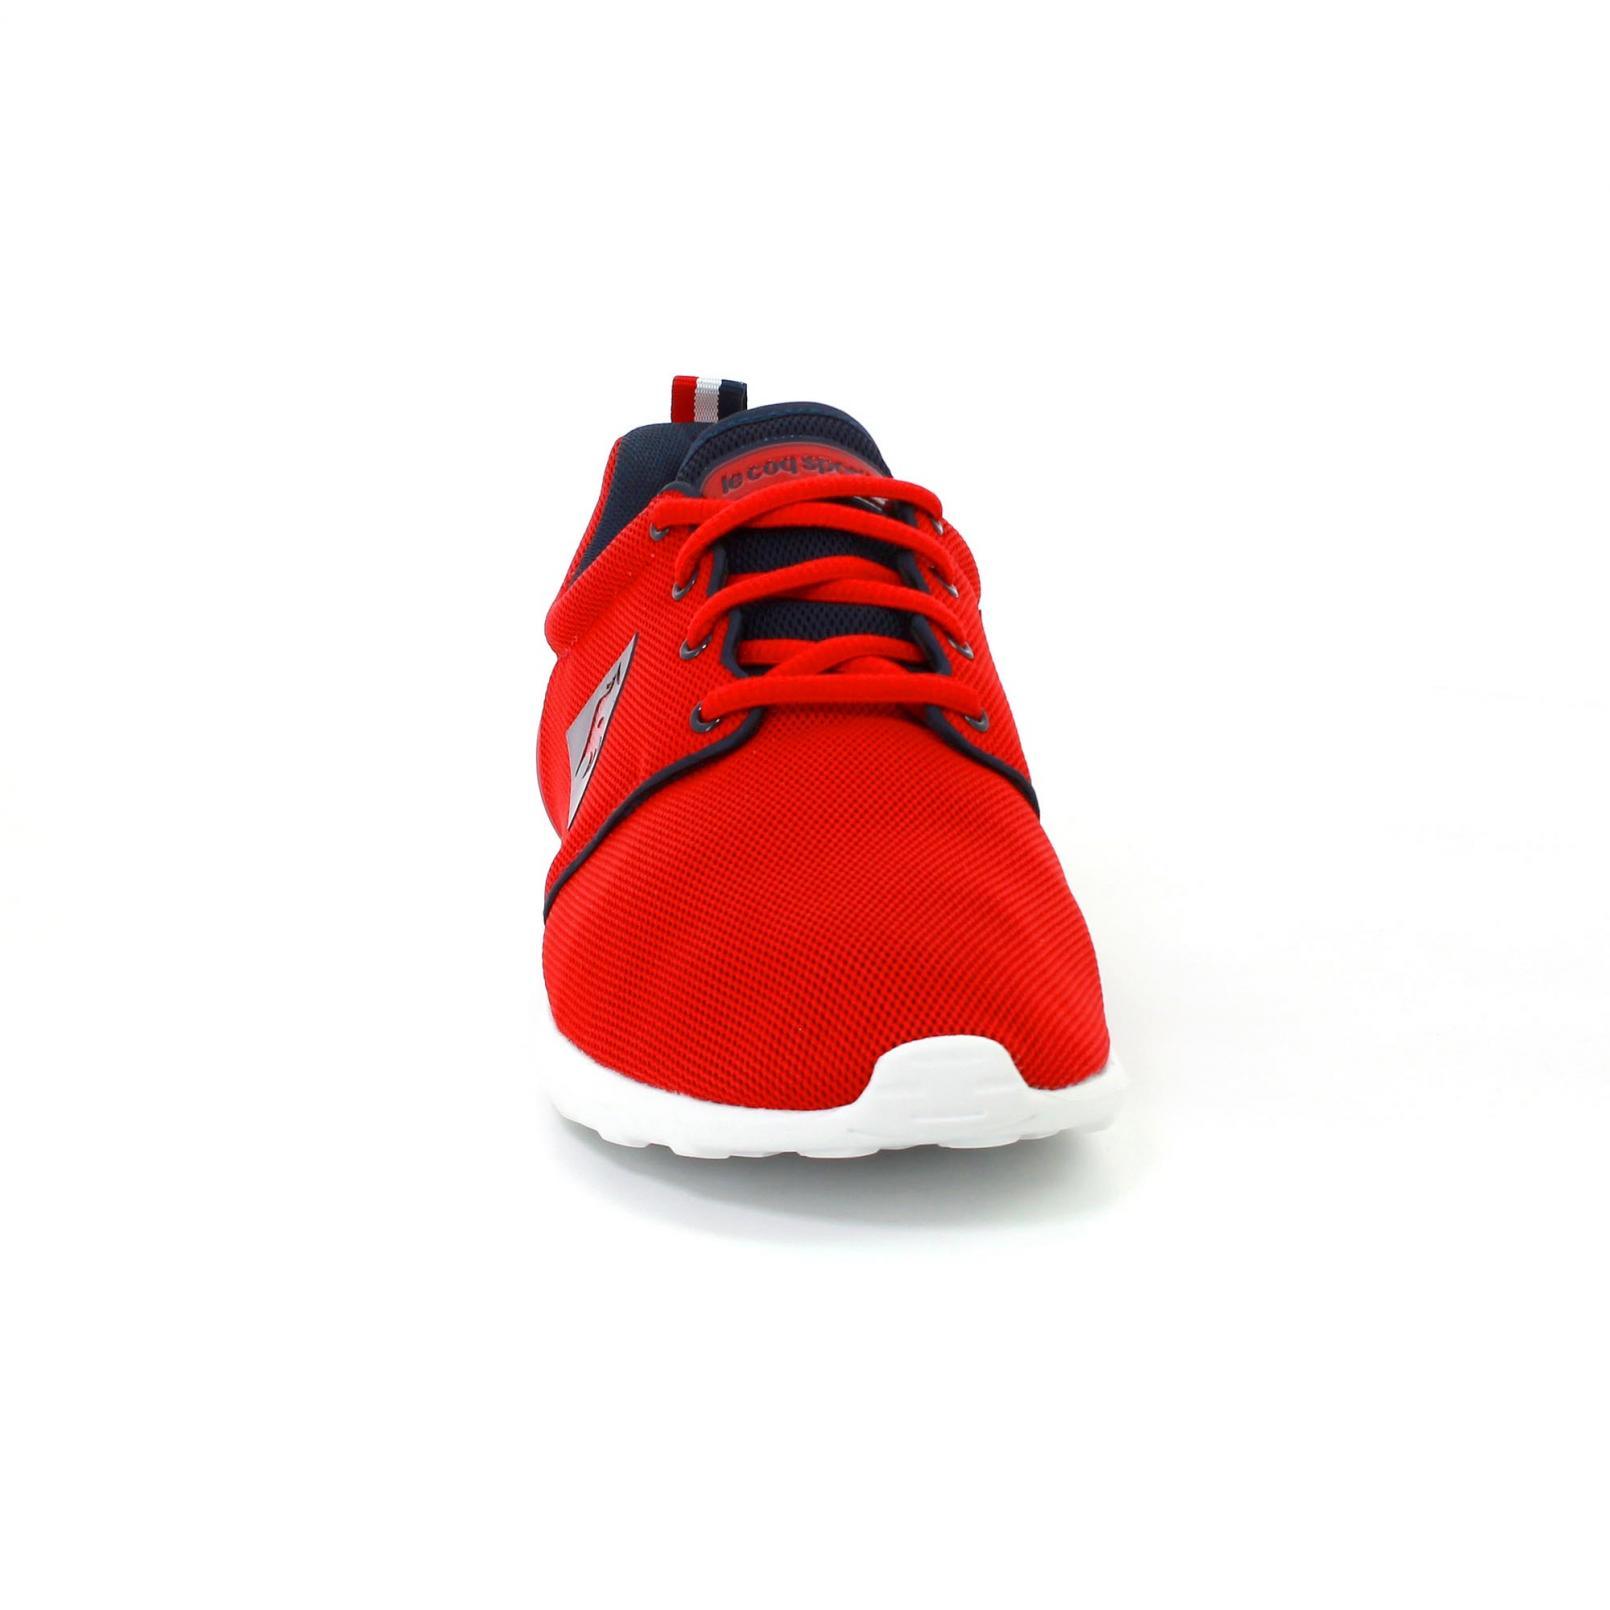 Shoes – Le Coq Sportif Dynacomf Mesh Red/Blue